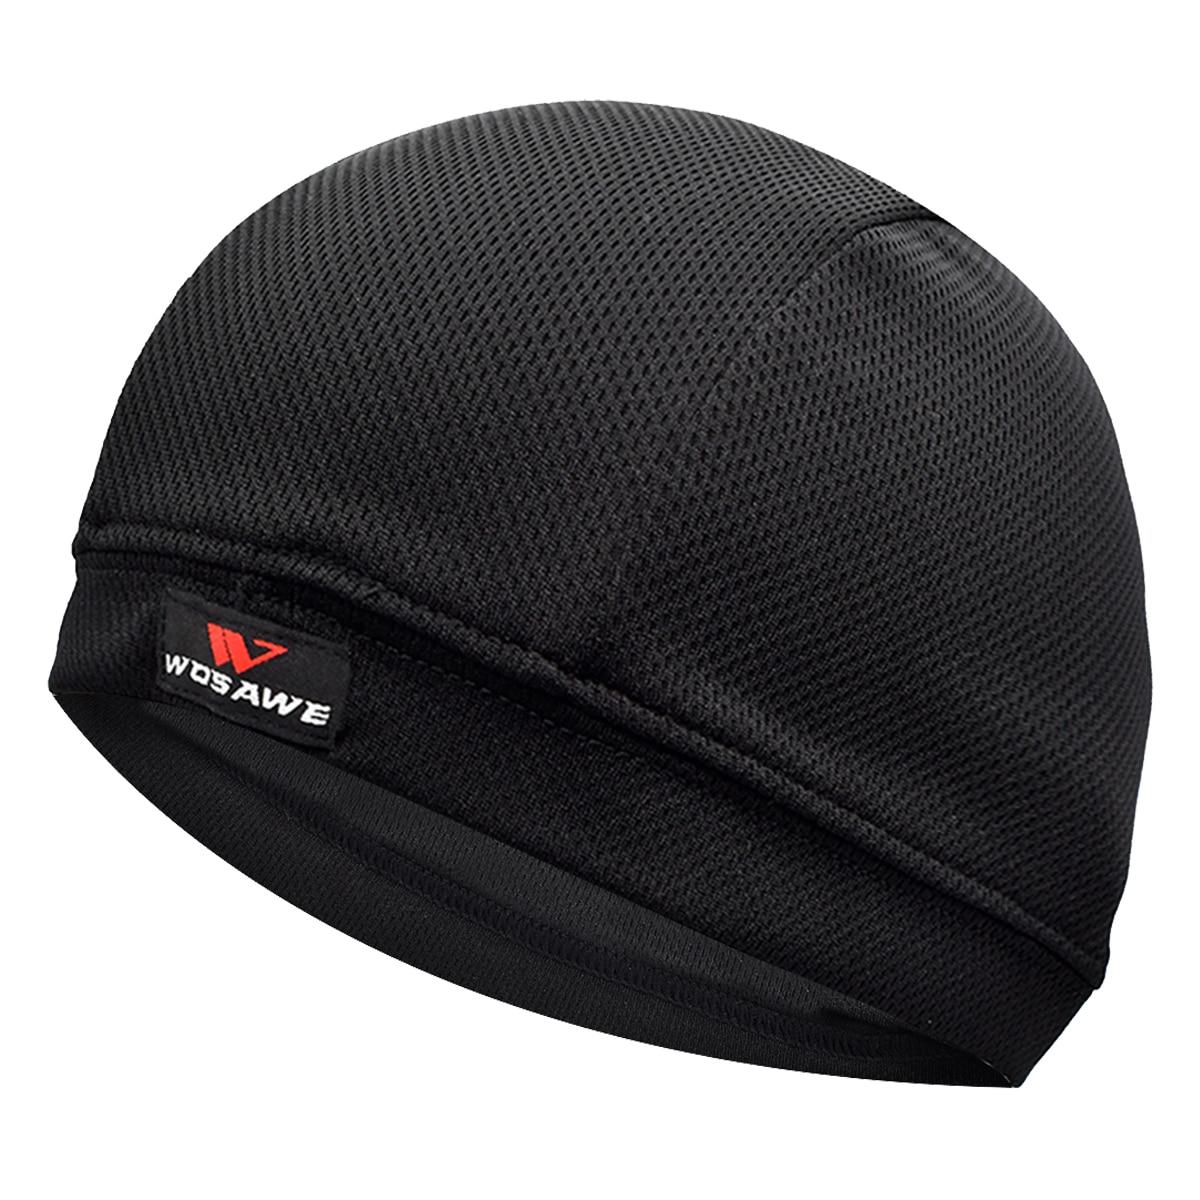 Motorcycle Cycling Helmet Inner Skull Cap Racing Hat Quick Dry Breathable Sweat